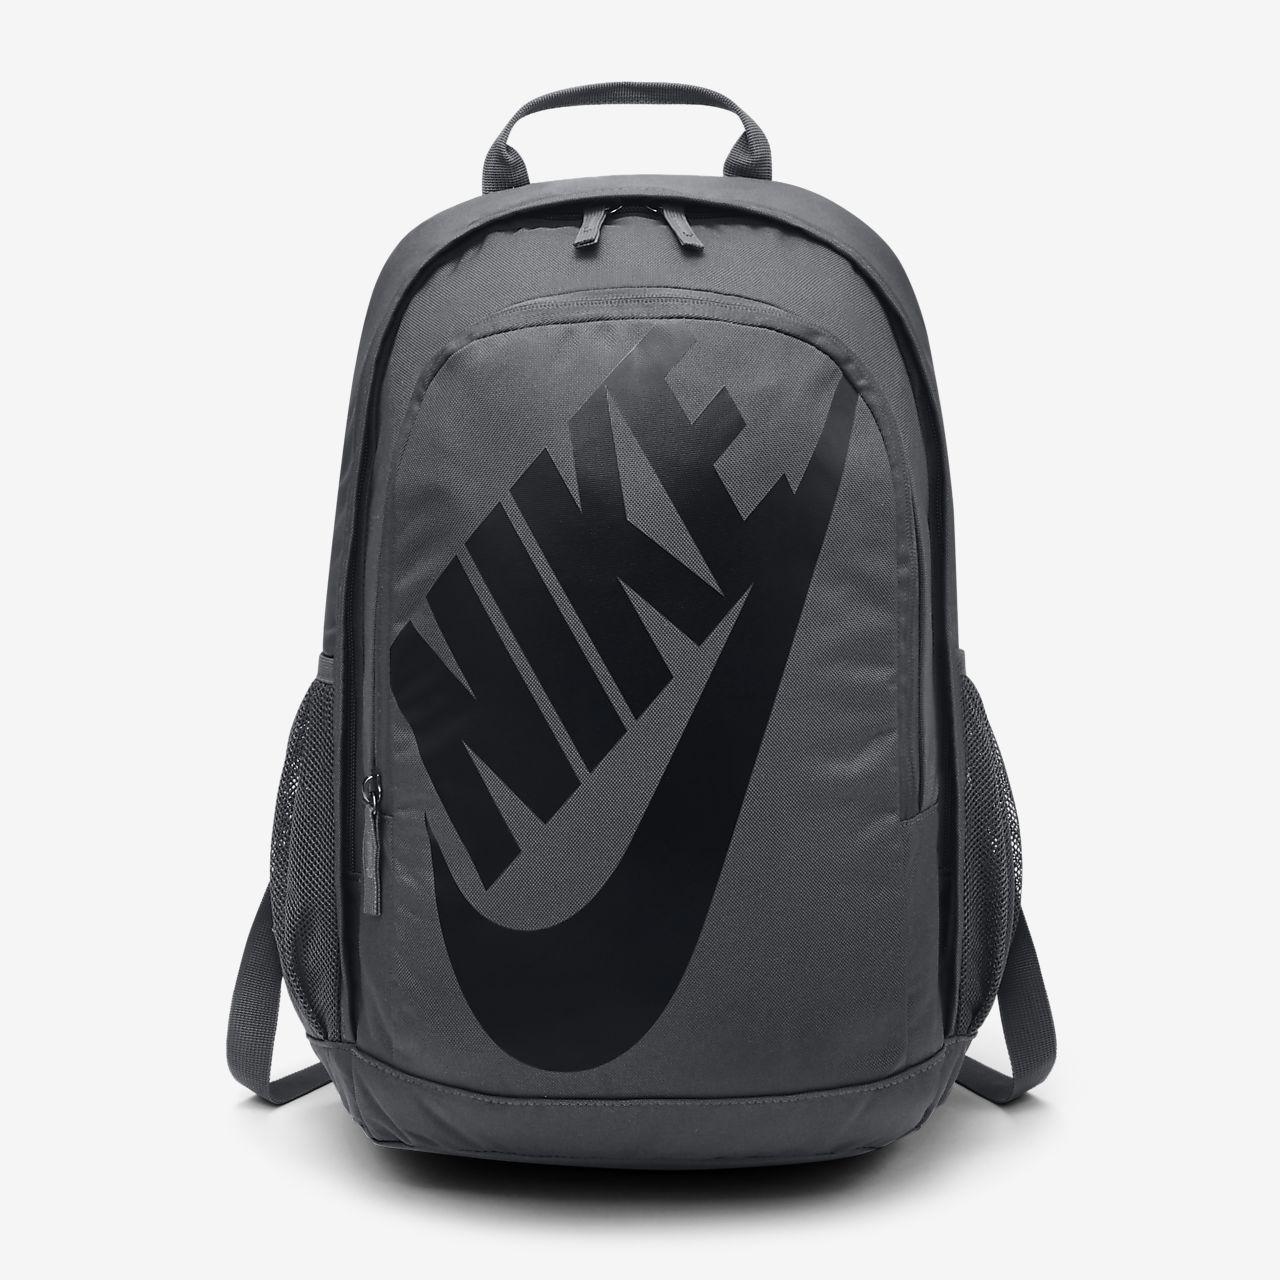 Comprar Ofertas Baratas Wiki En Venta Nike Sportswear Hayward Futura 2.0 61psJ